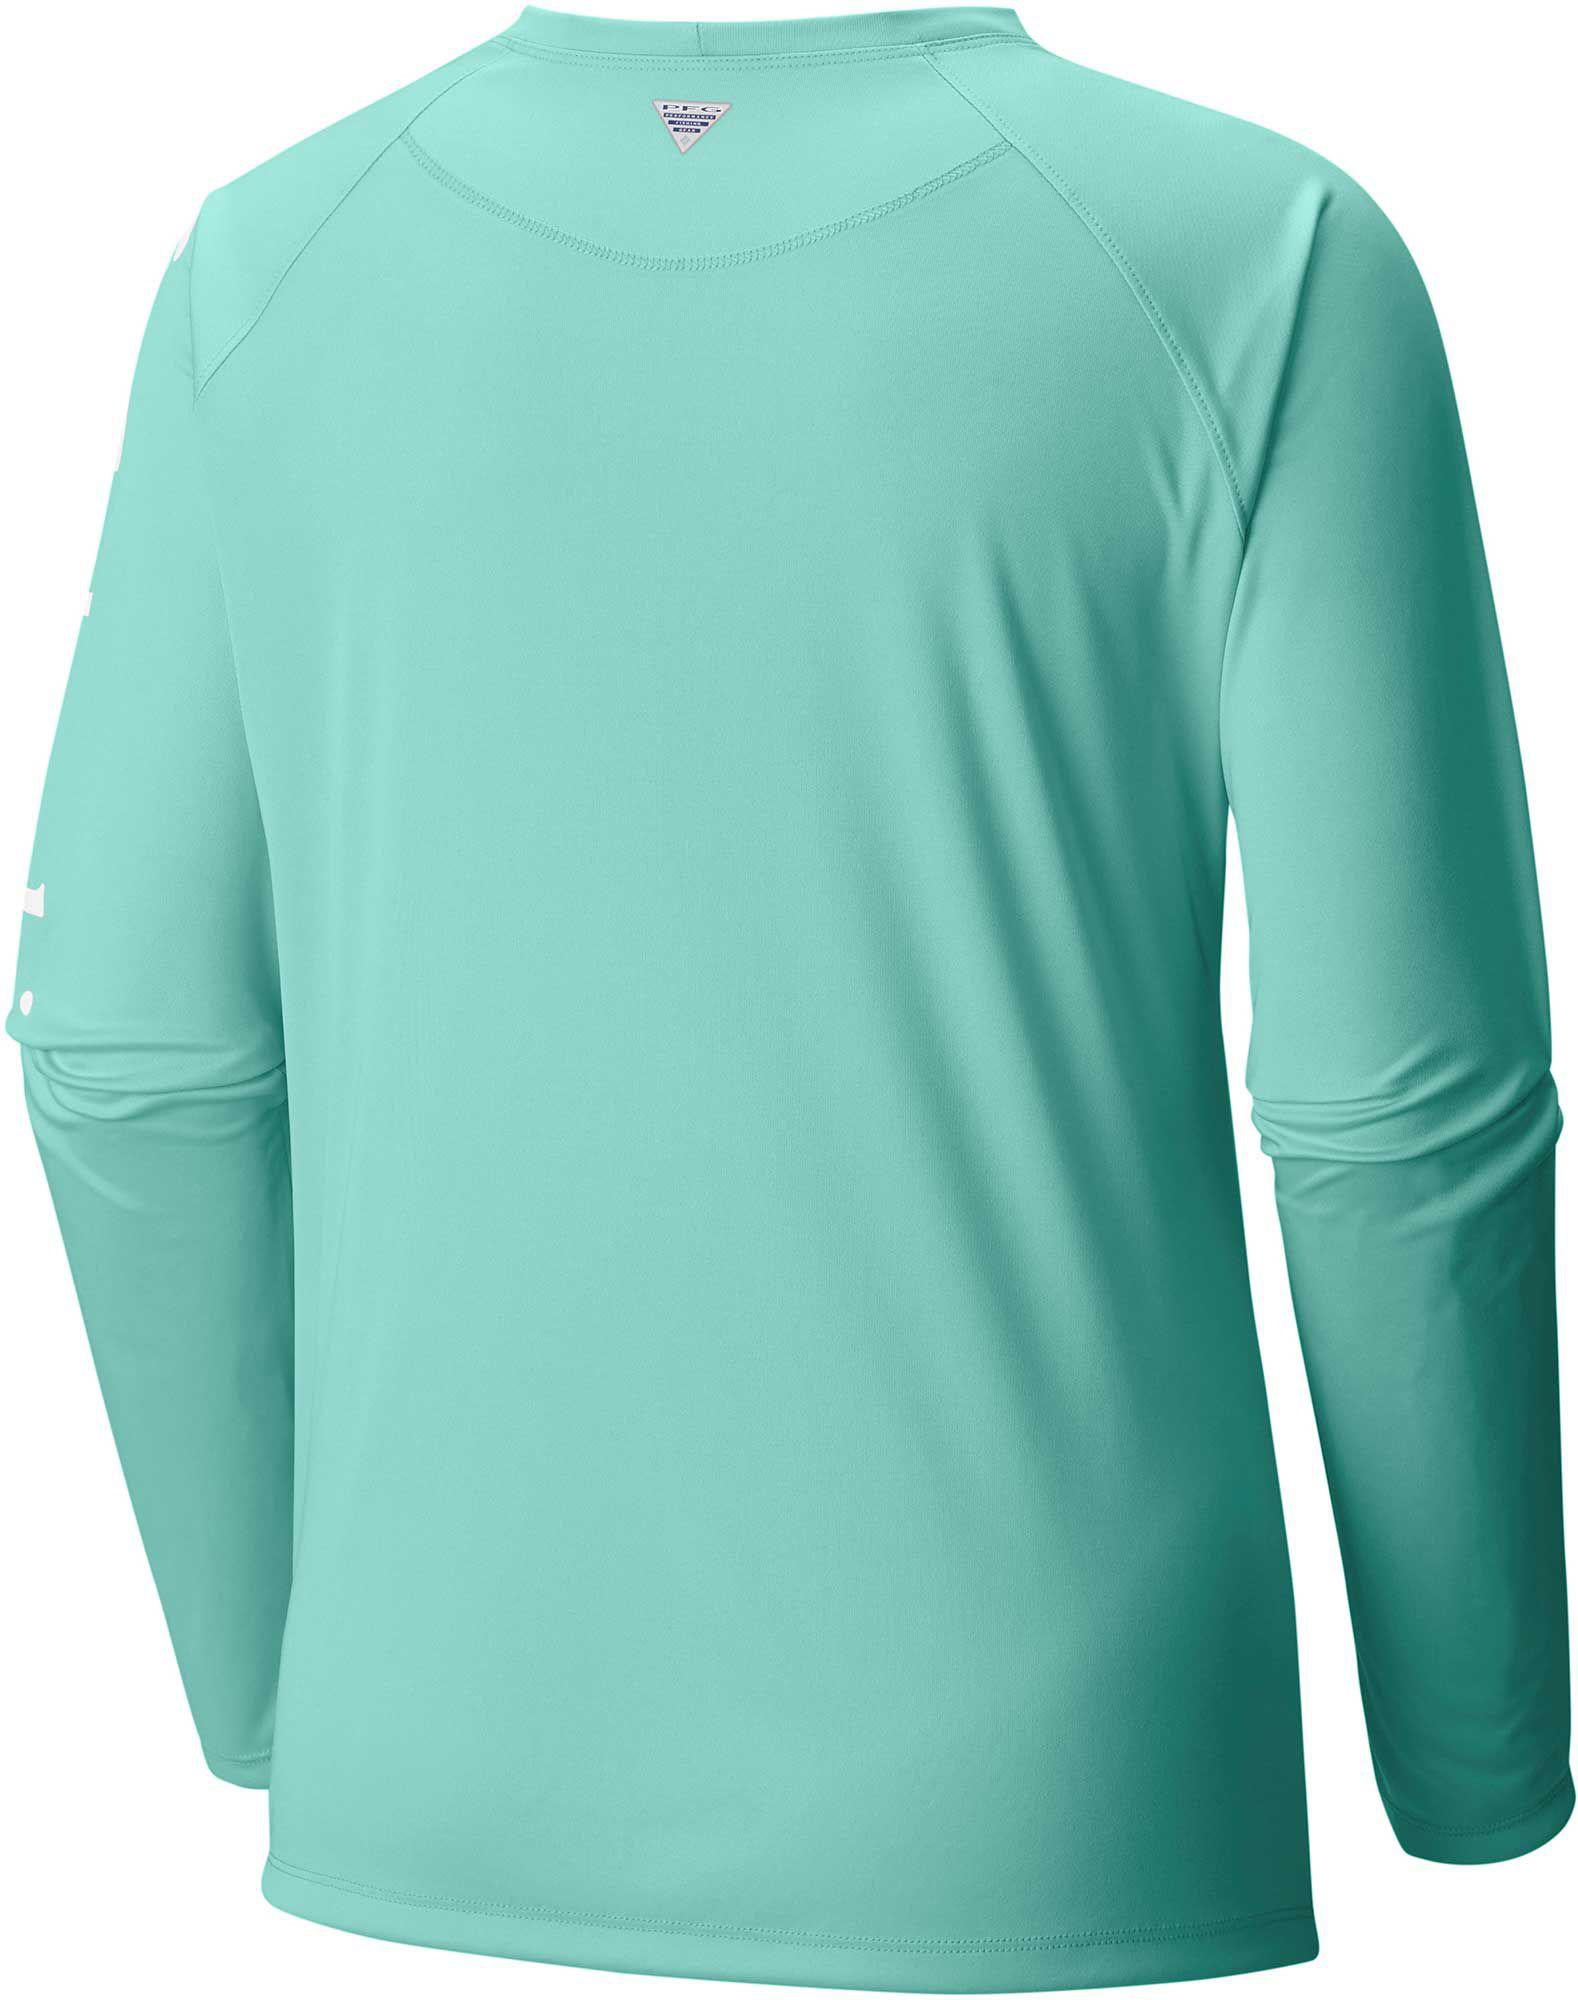 d077a1ae197 ... Pfg Tidal Tee Ii Long Sleeve Shirt - Lyst. View fullscreen